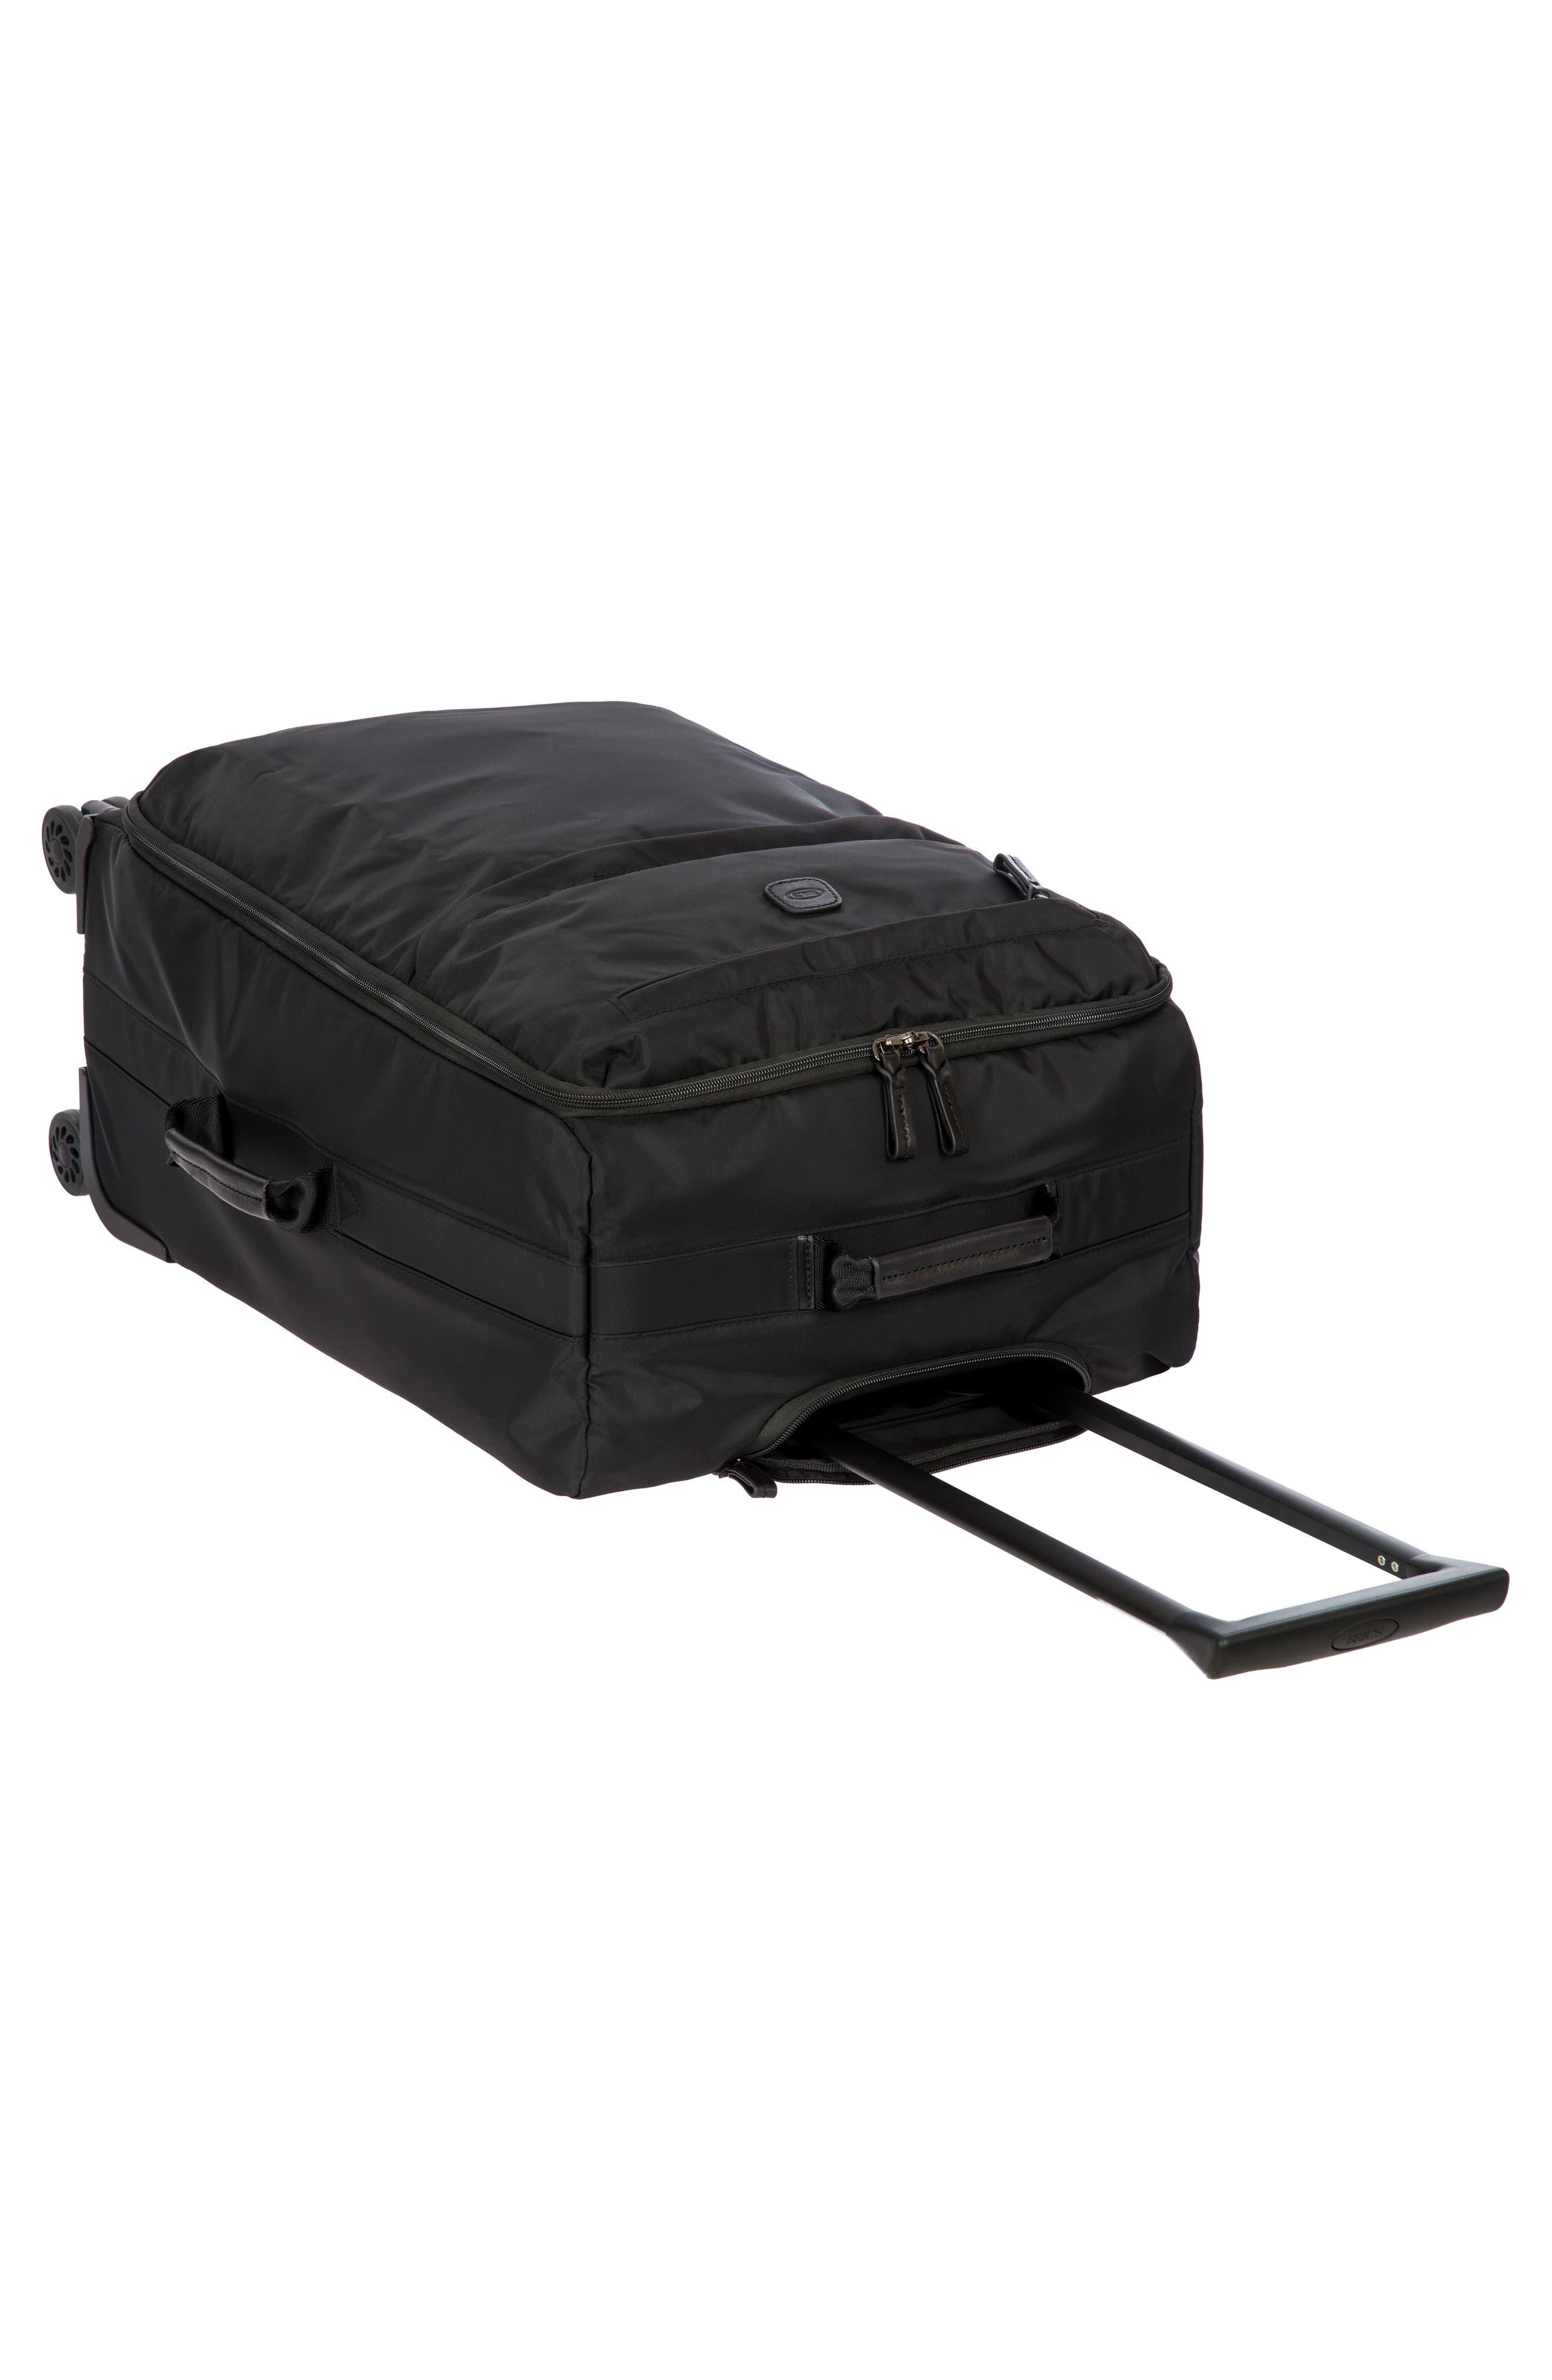 X-Bag 25-Inch Spinner Suitcase,                             Alternate thumbnail 7, color,                             BLACK/ BLACK